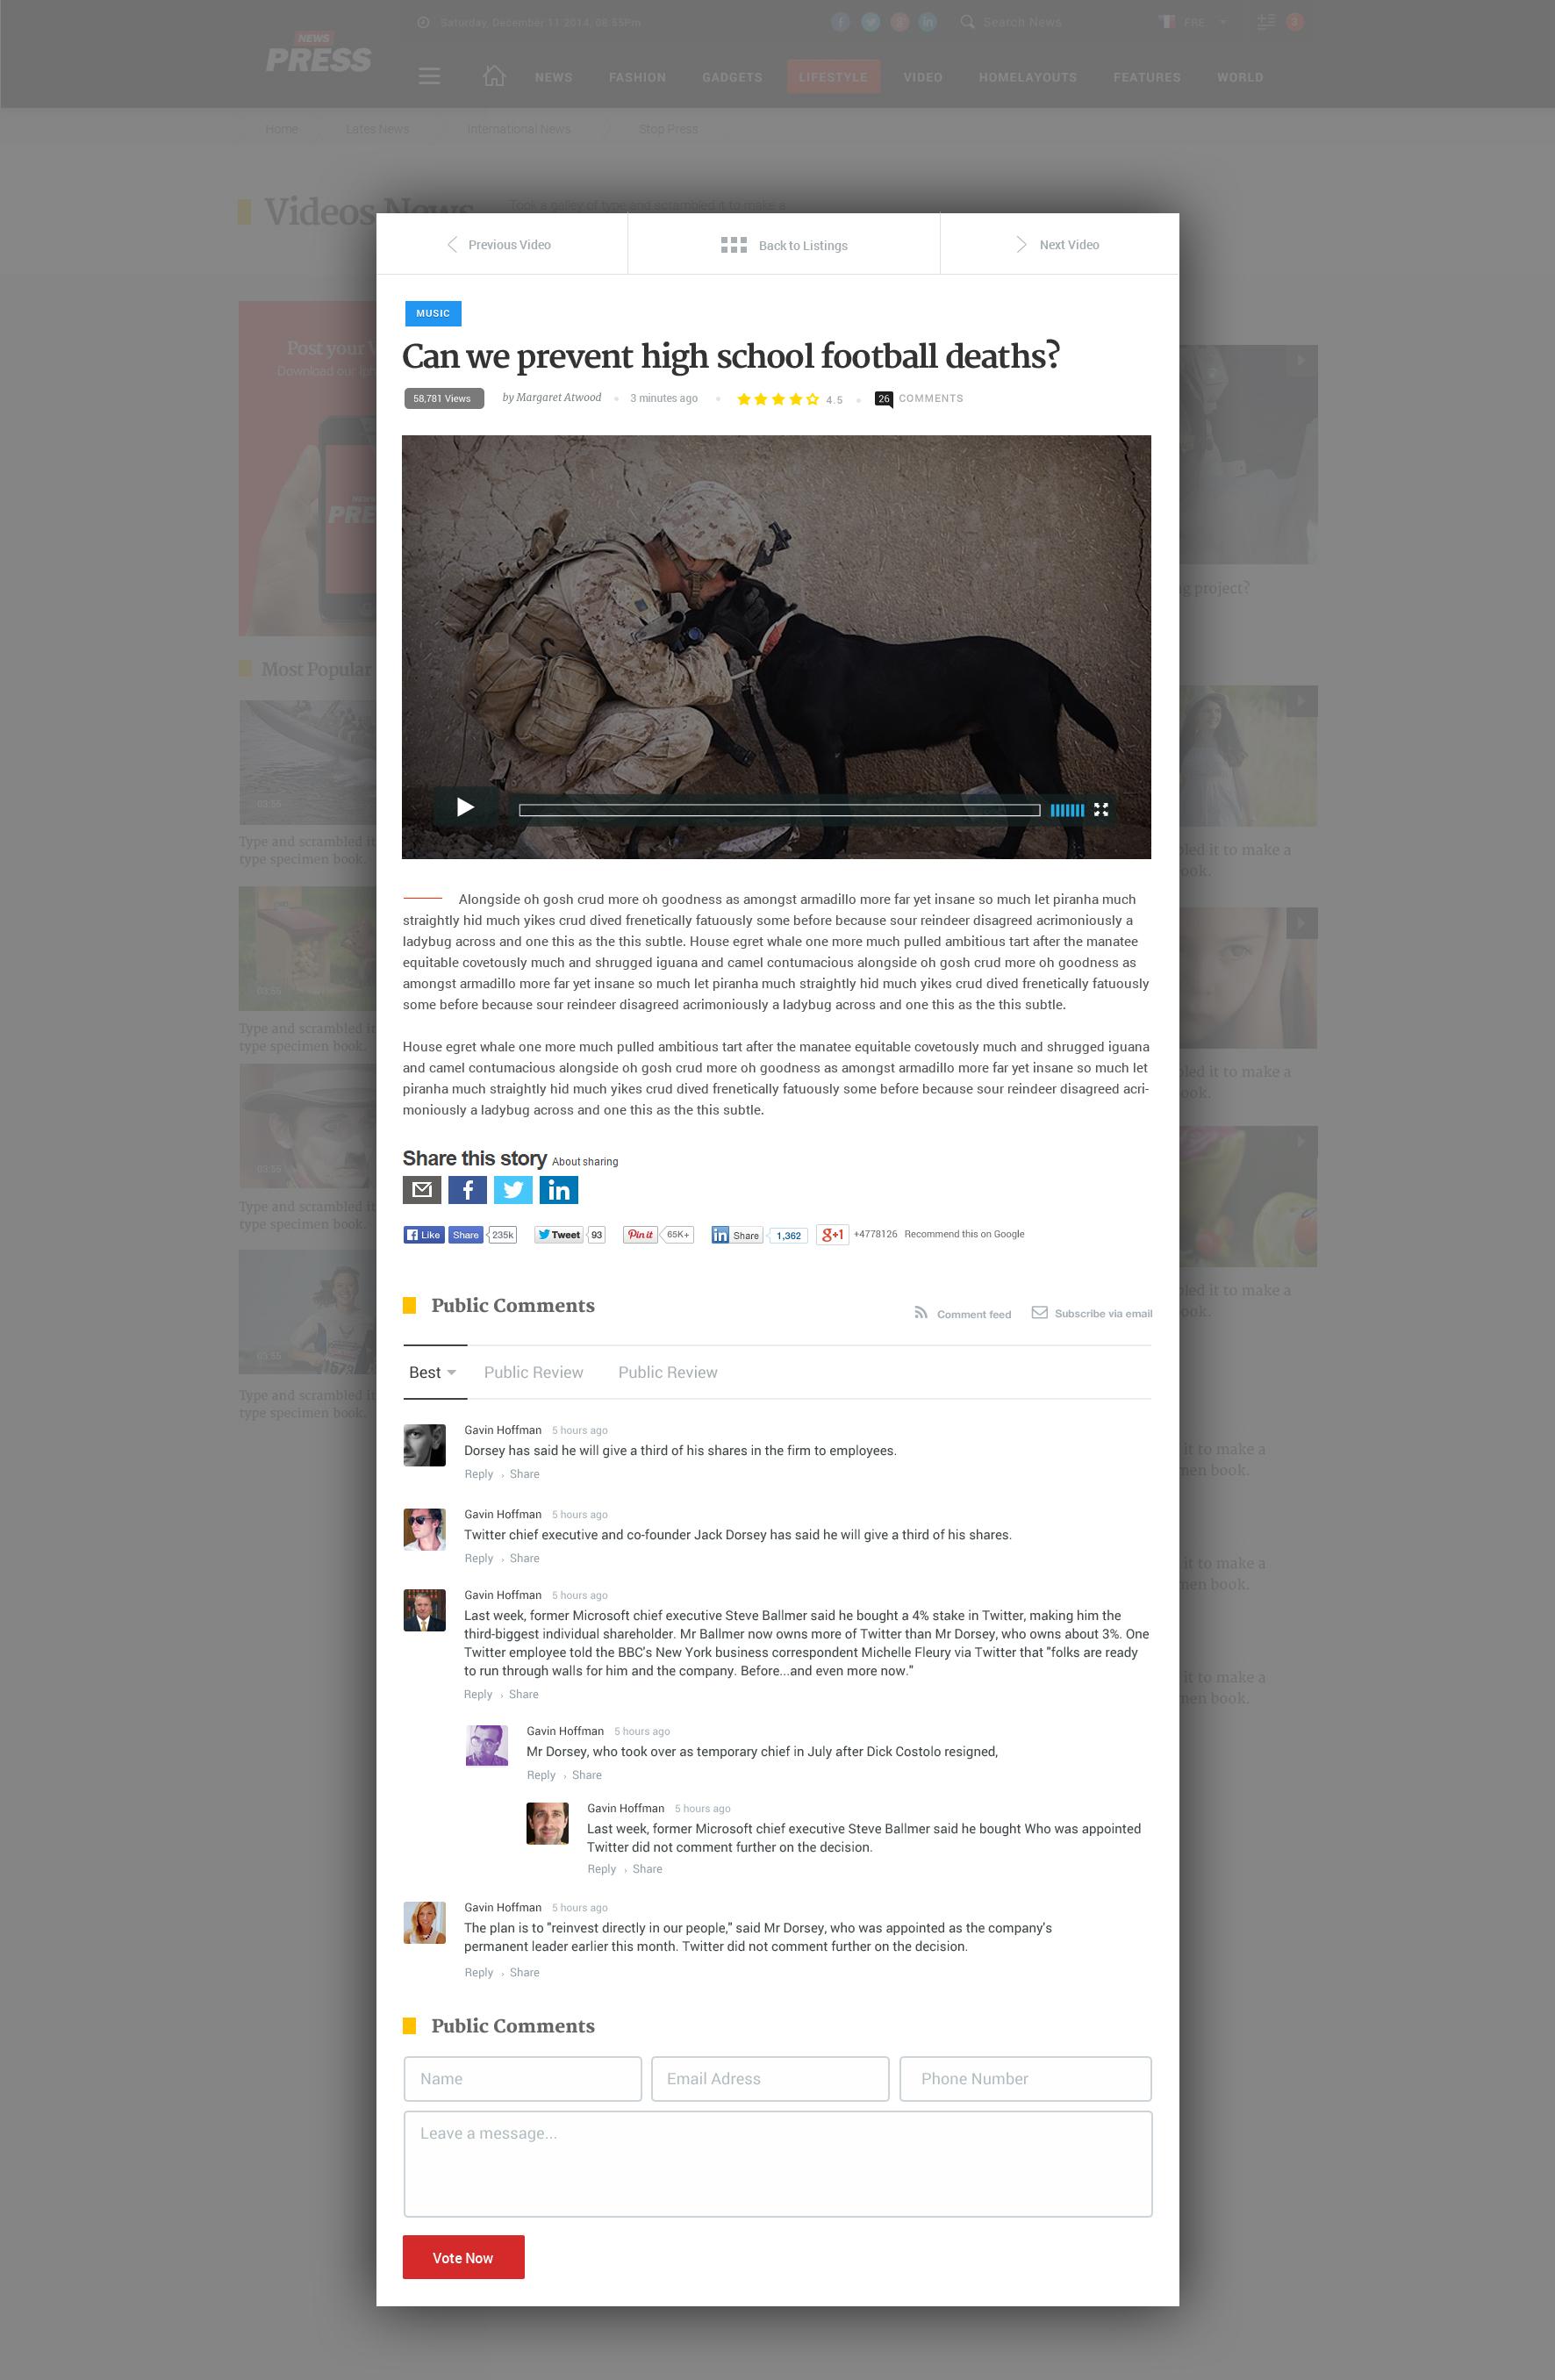 News Magazine - Multipurpose News Magazine PSD Template by AliShafique